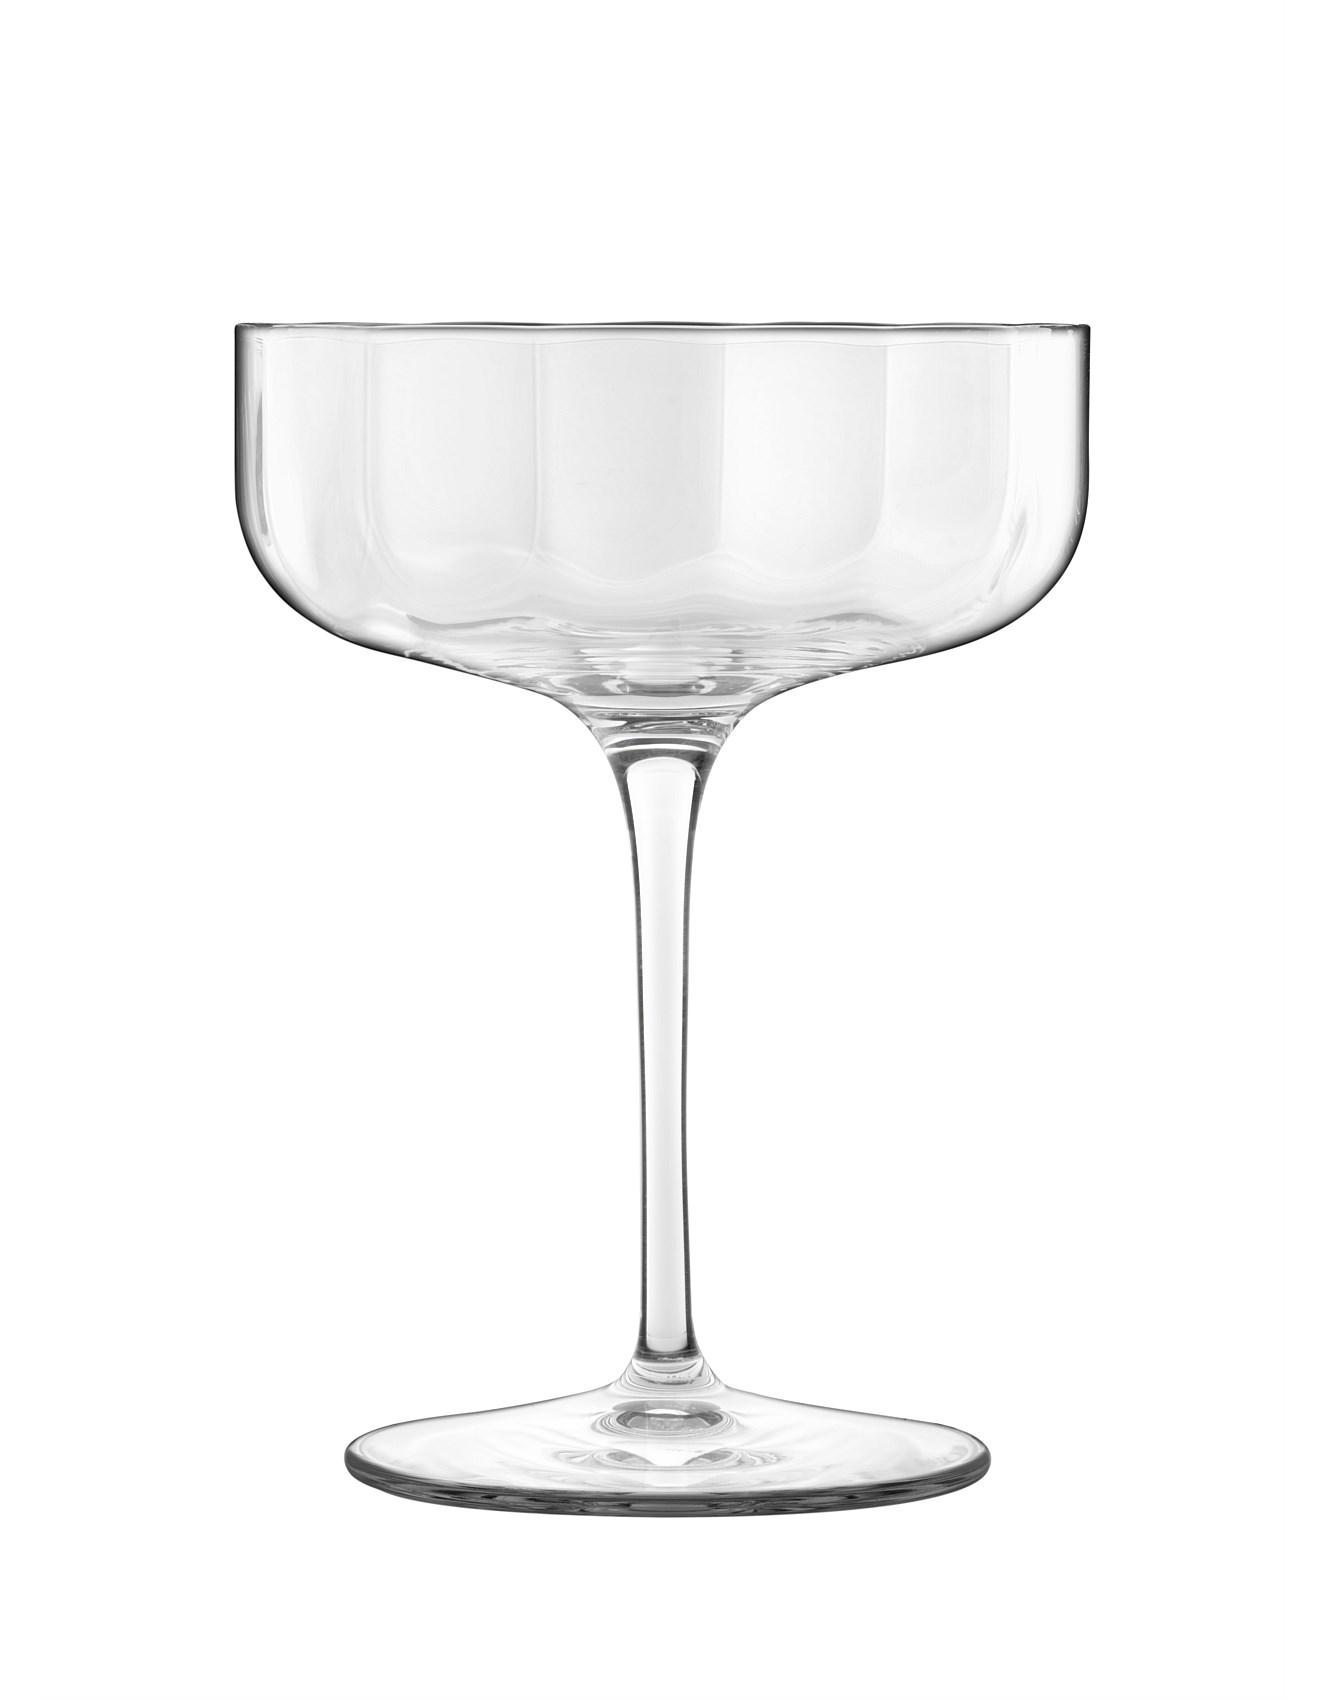 Luigi Bormioli Luigi Bormioli Glasses More David Jones Jazz Champagne Coupe 300ml Set Of Four